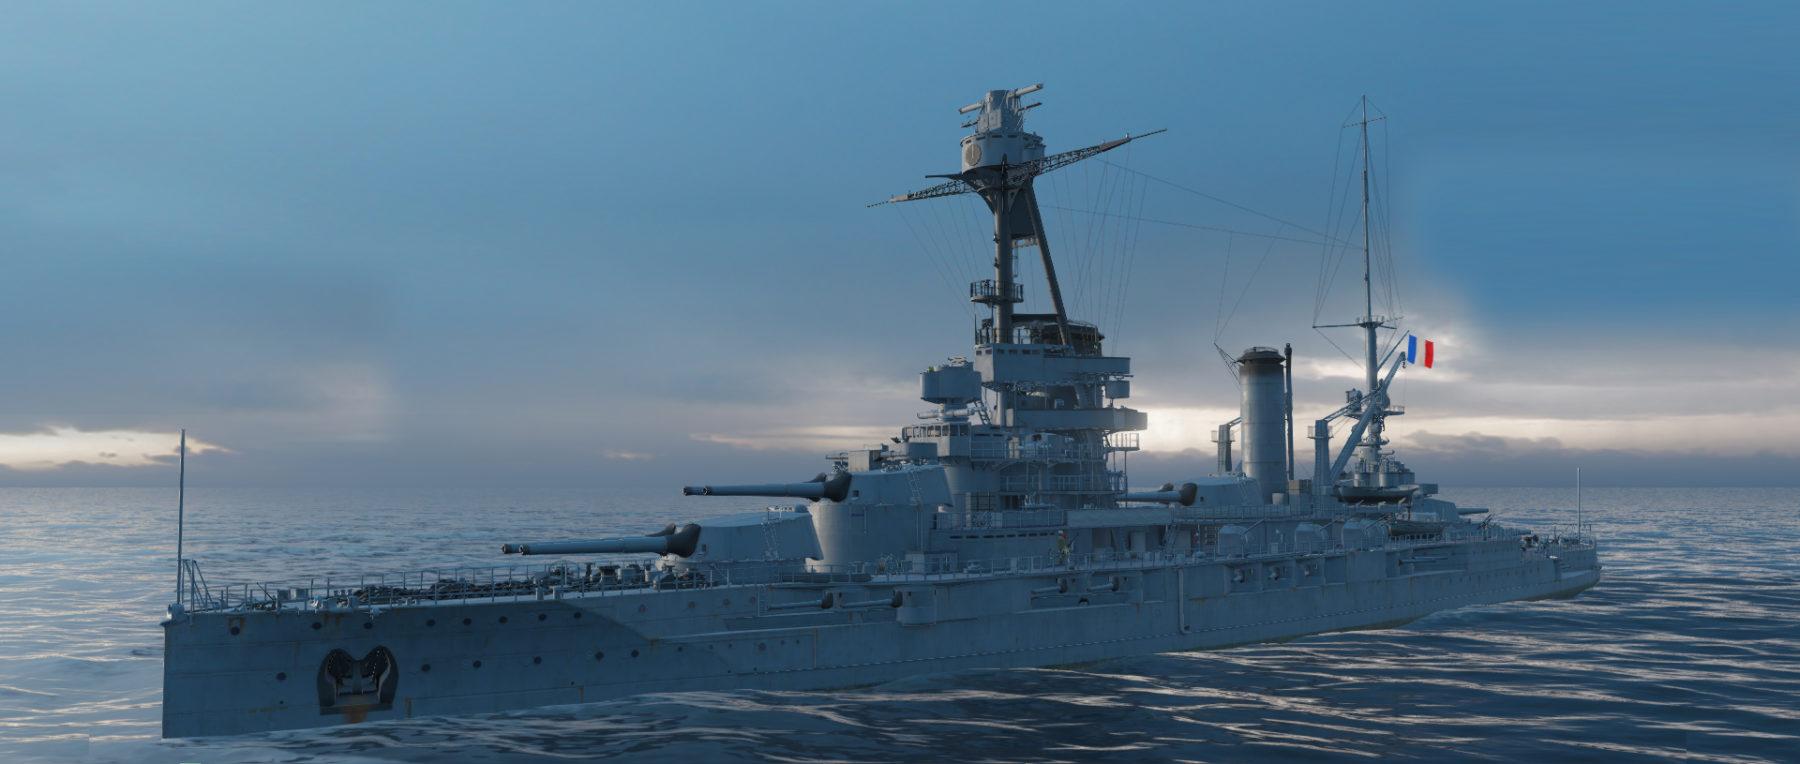 Bretagne class battleships